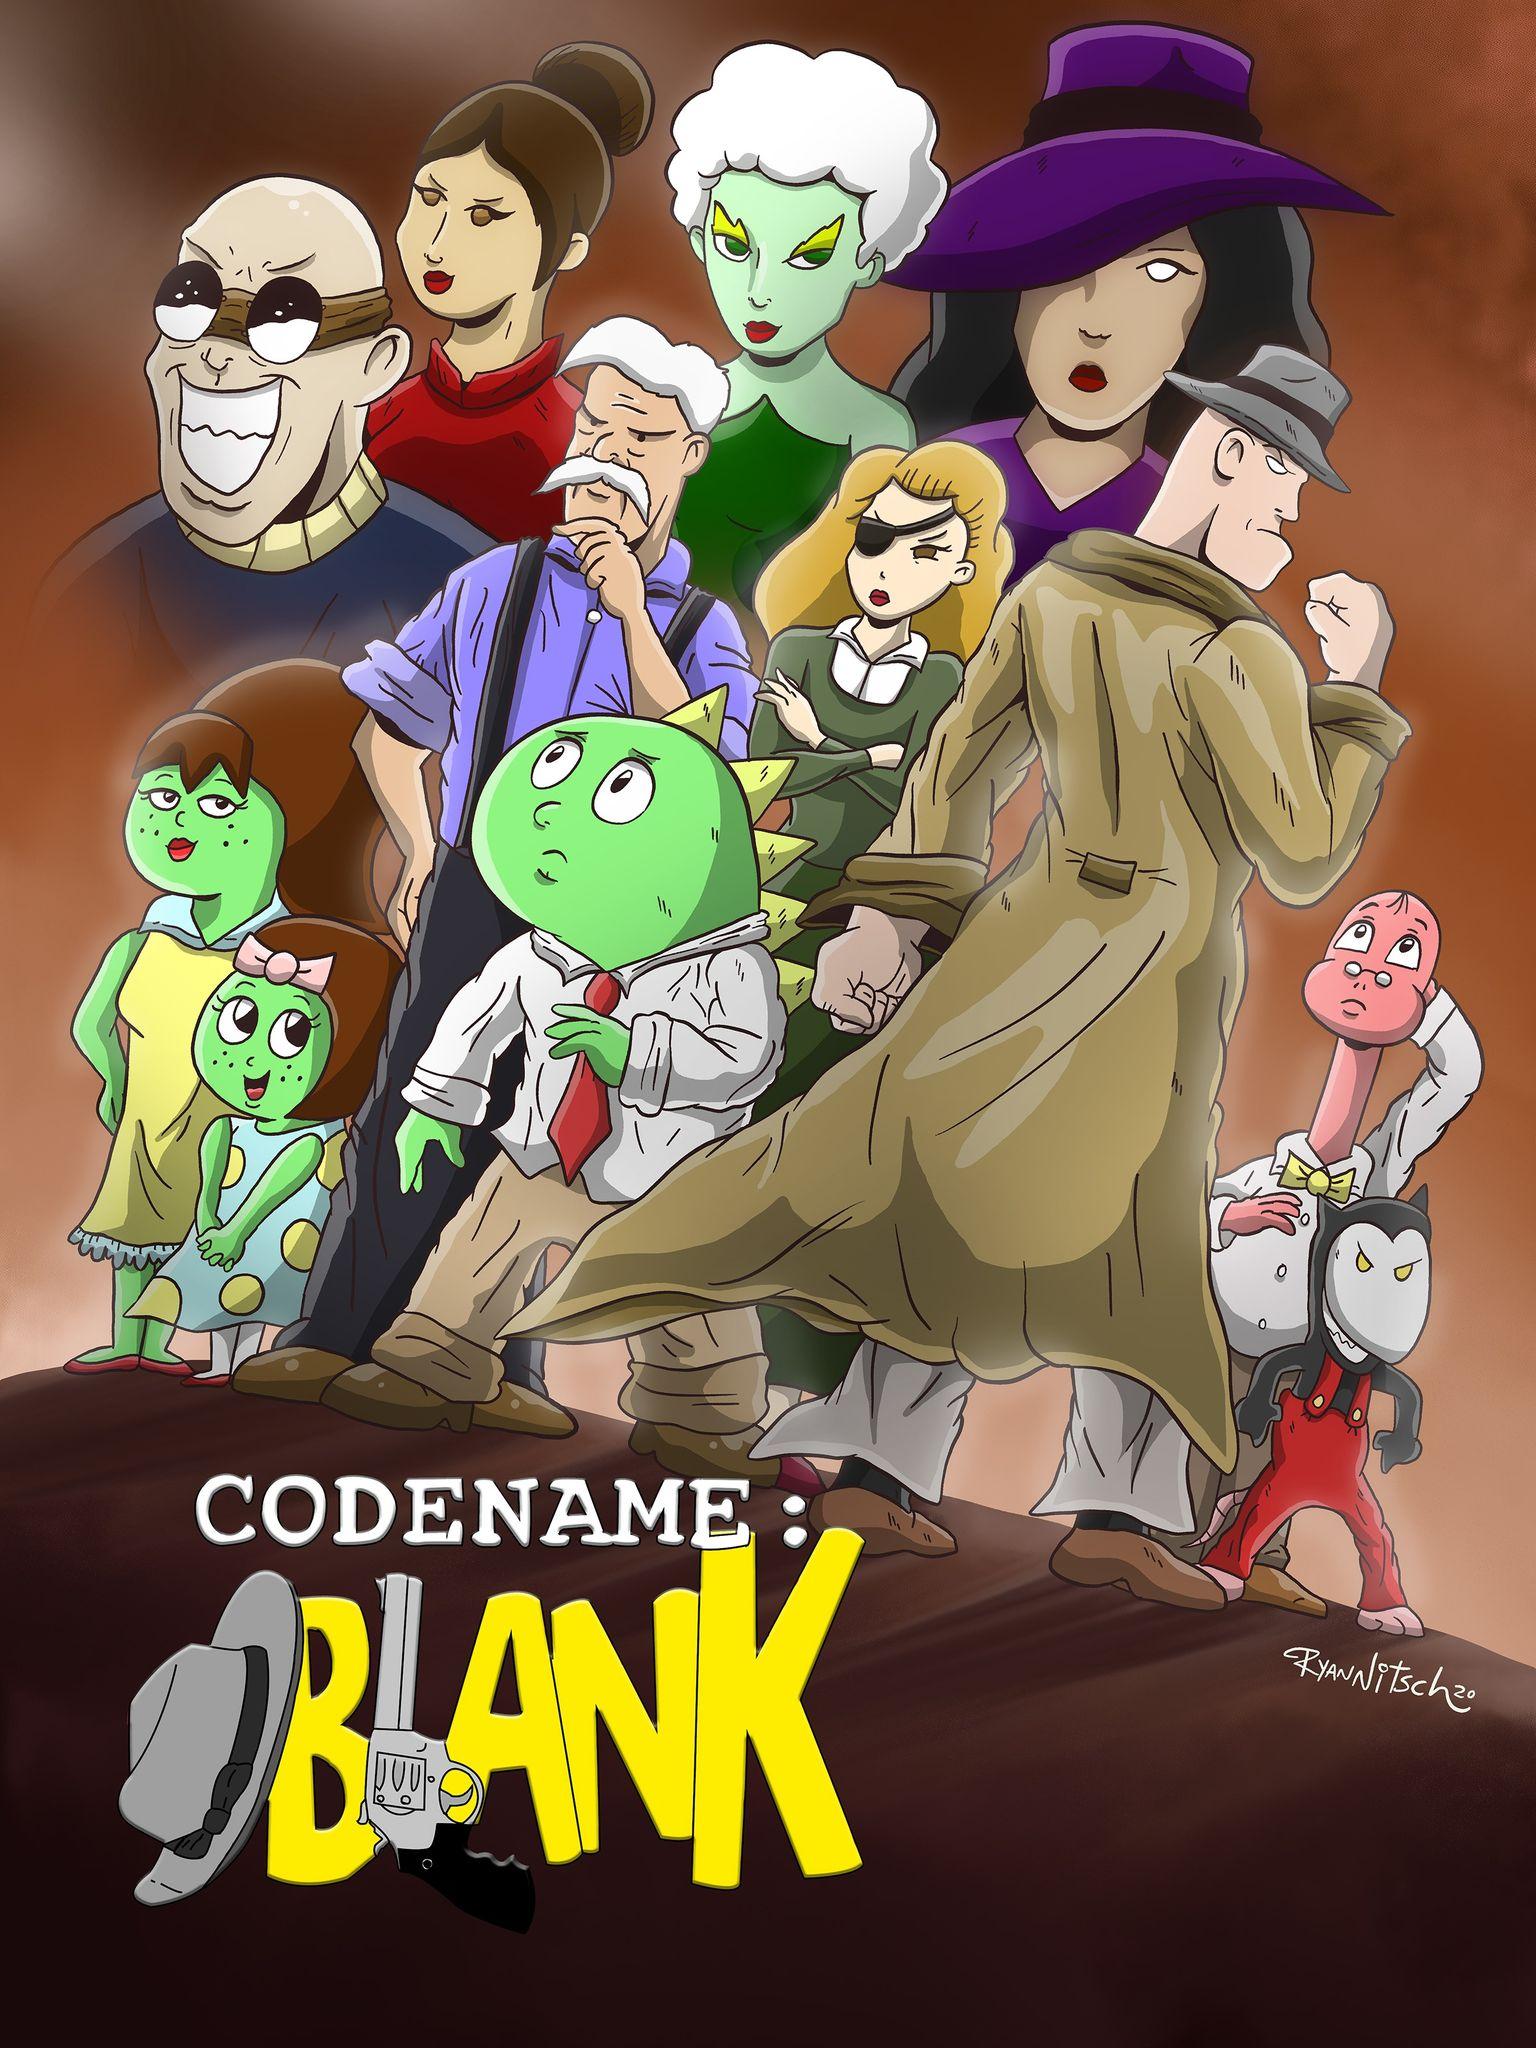 Codename: Blank show art